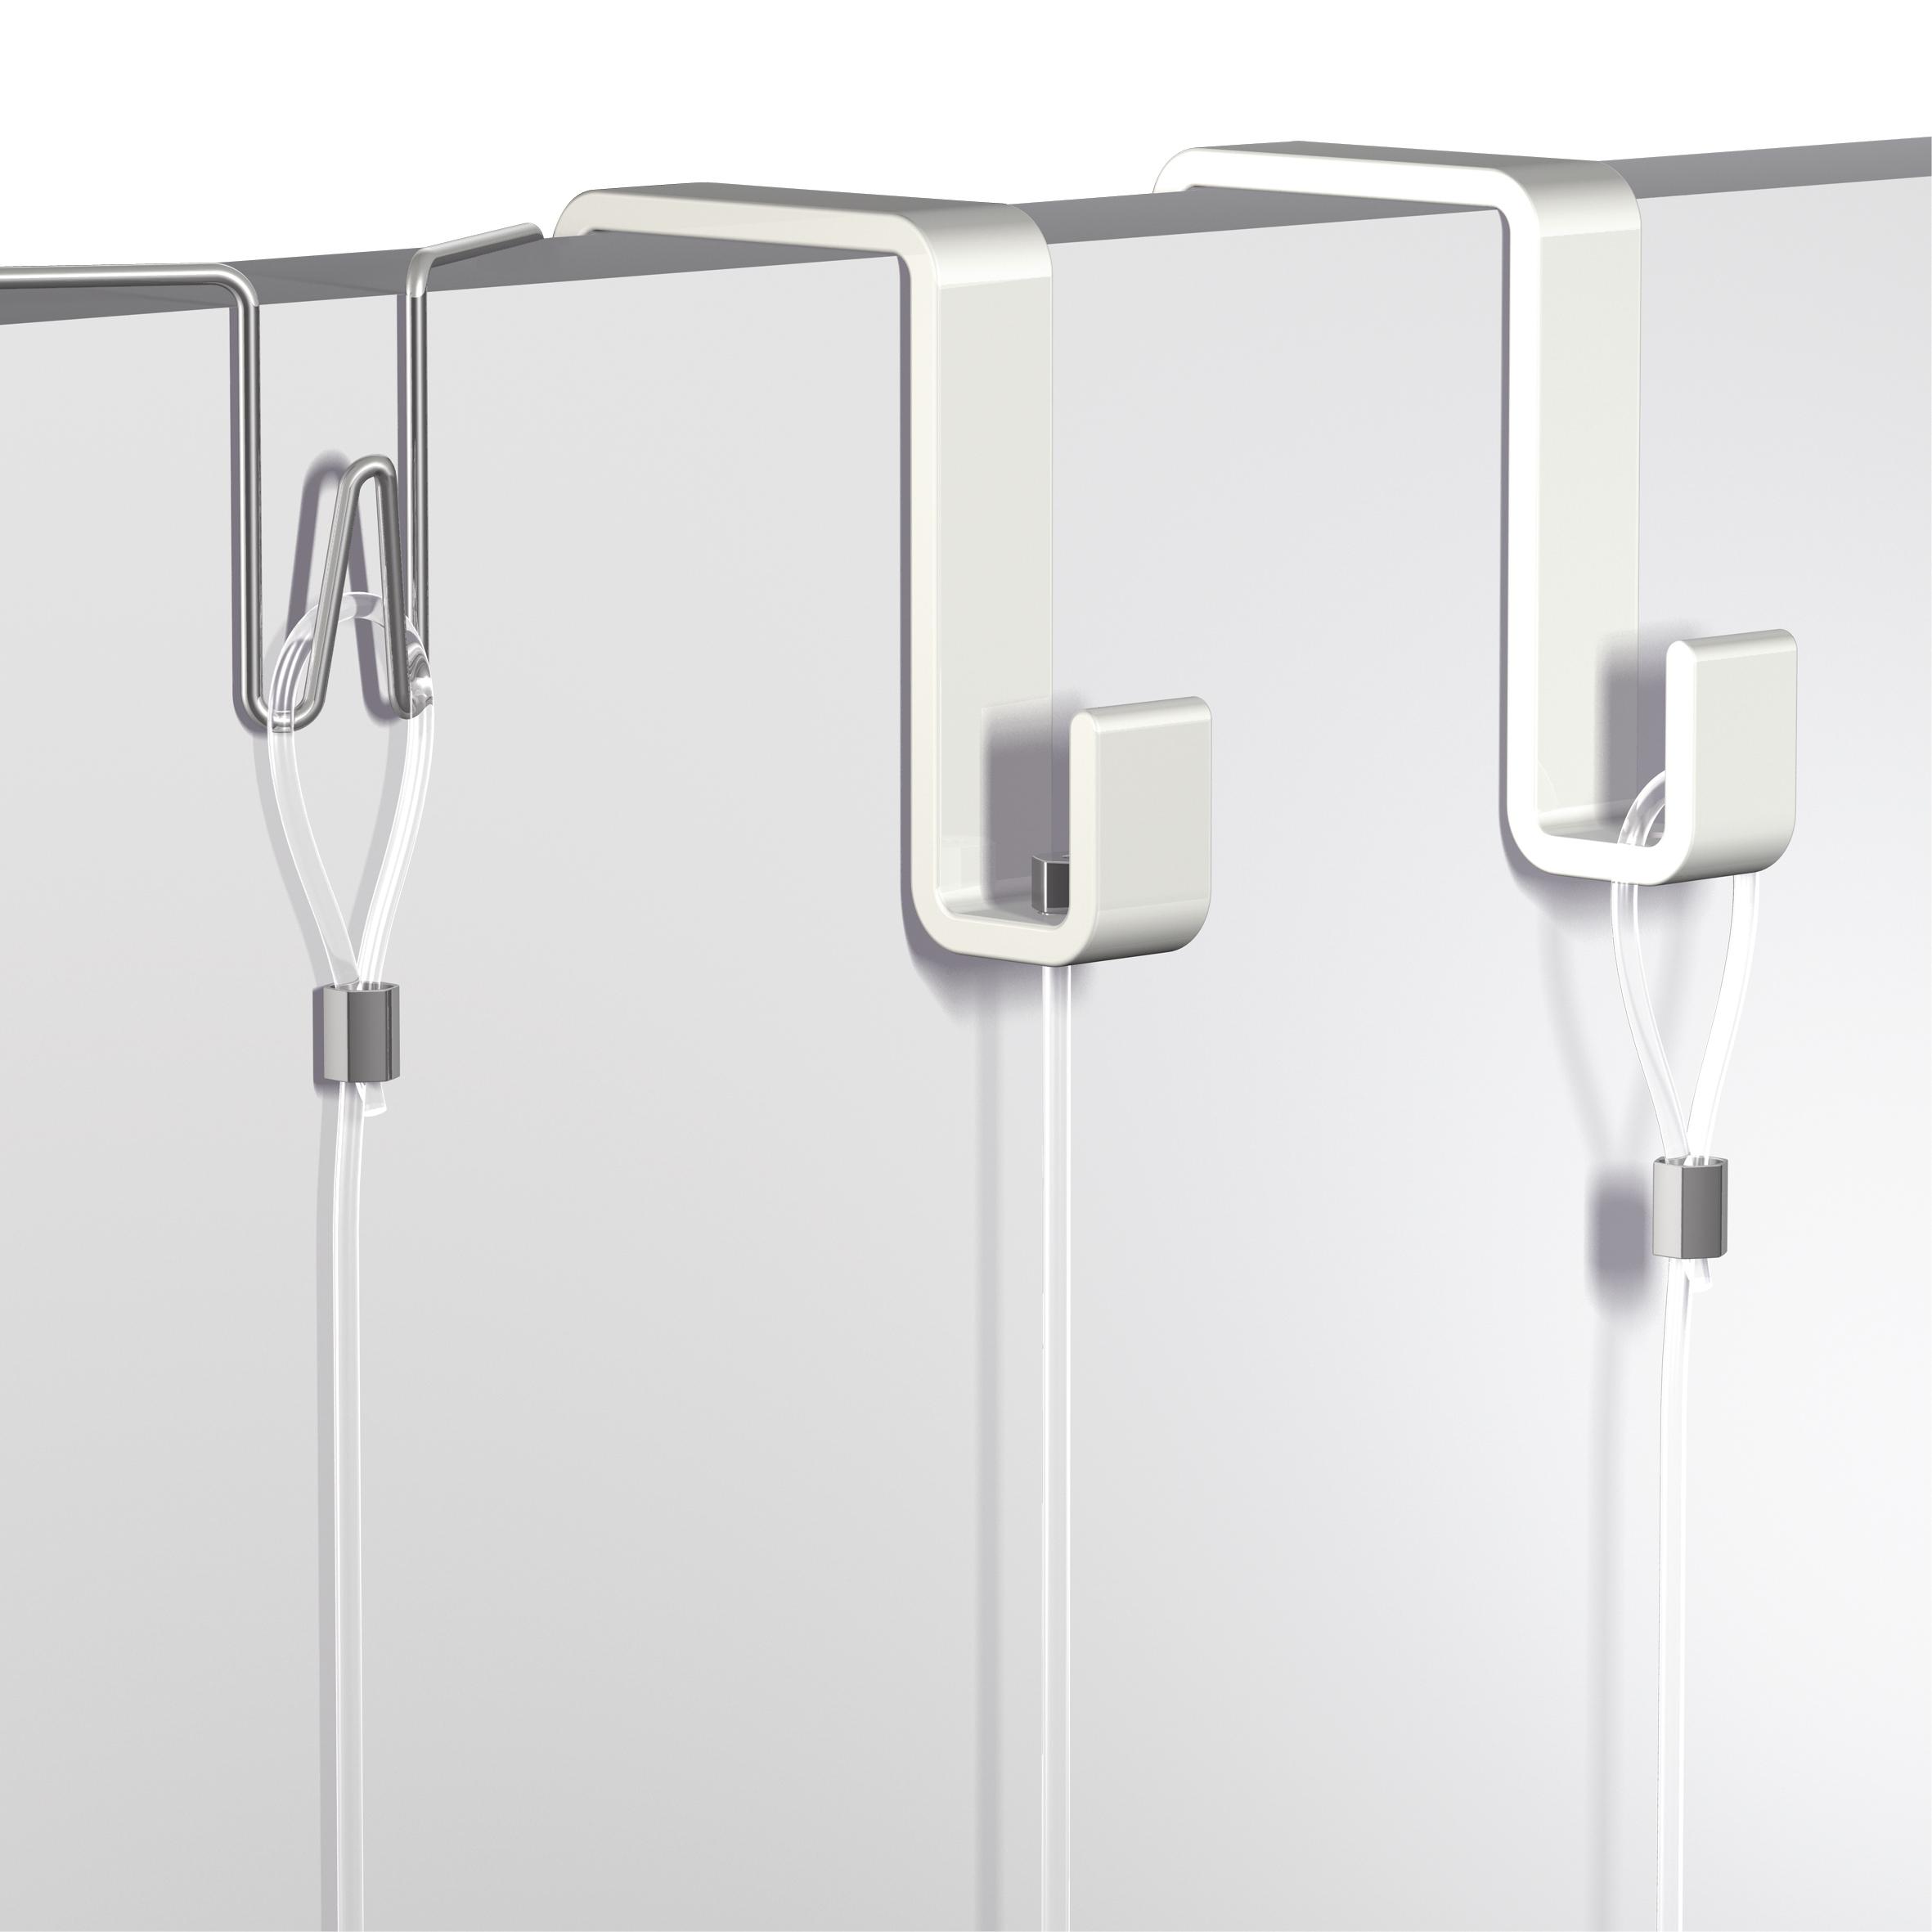 Attache Tableau Sans Percer crochet flexible pour panneaux de stand 31 - 55 mm crochet flexible pour